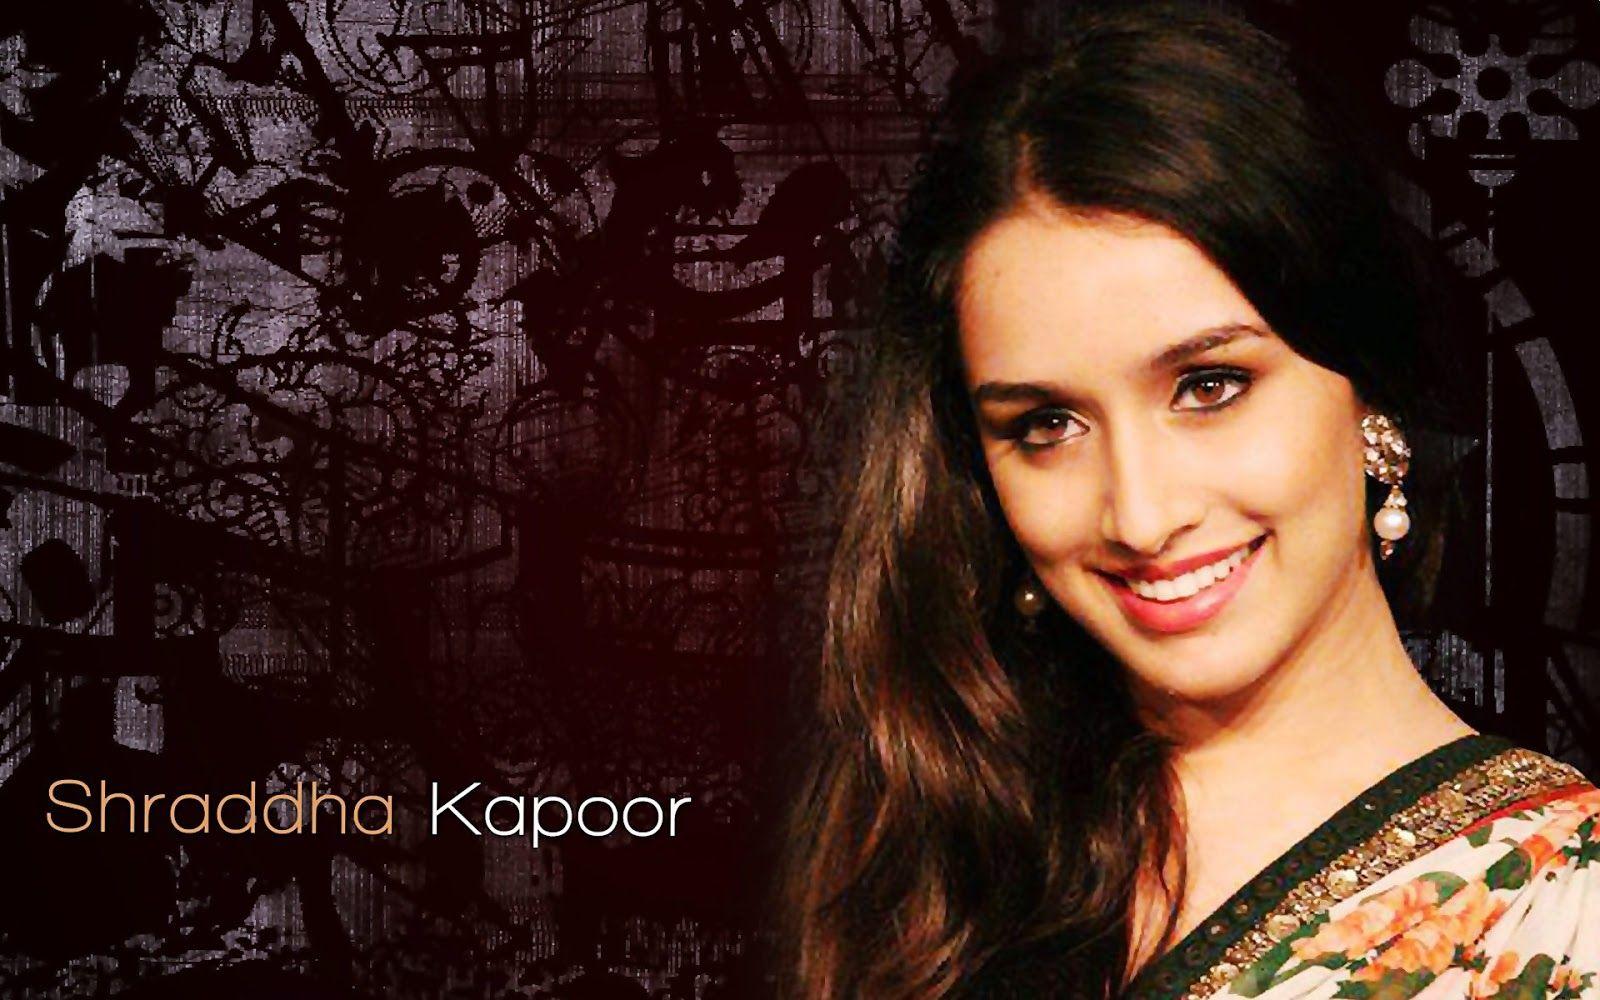 Download cute arjun kapoor smile hd wallpaper latest hd wallpaper - Shraddha Kapoor Hd Images Hot Photos Wallpapers Hd Images